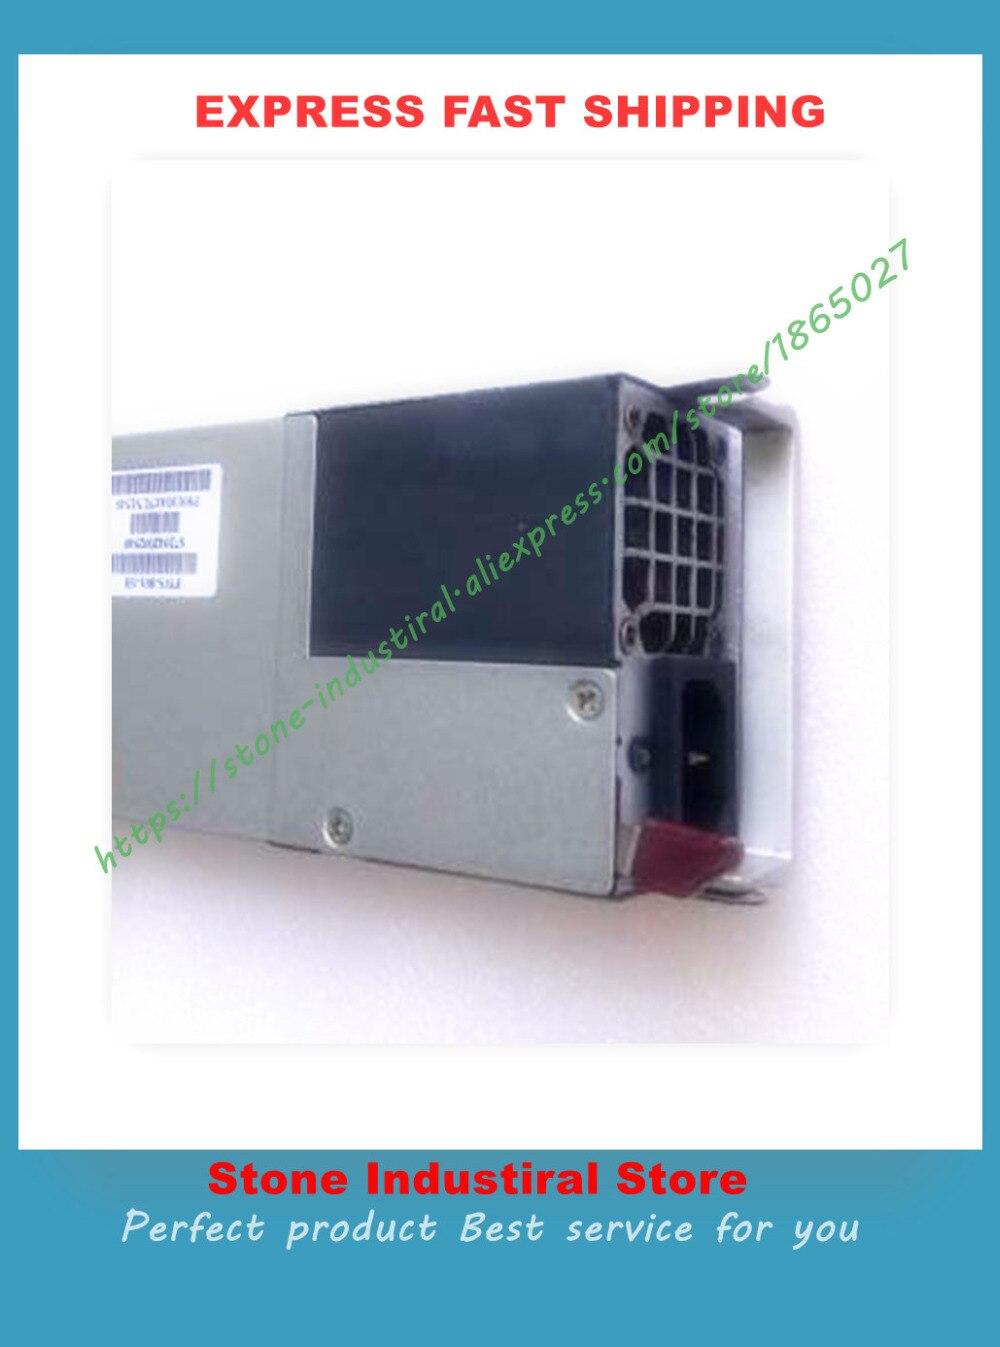 PWS 801 1R 800W Server Power Supply Work good good quality